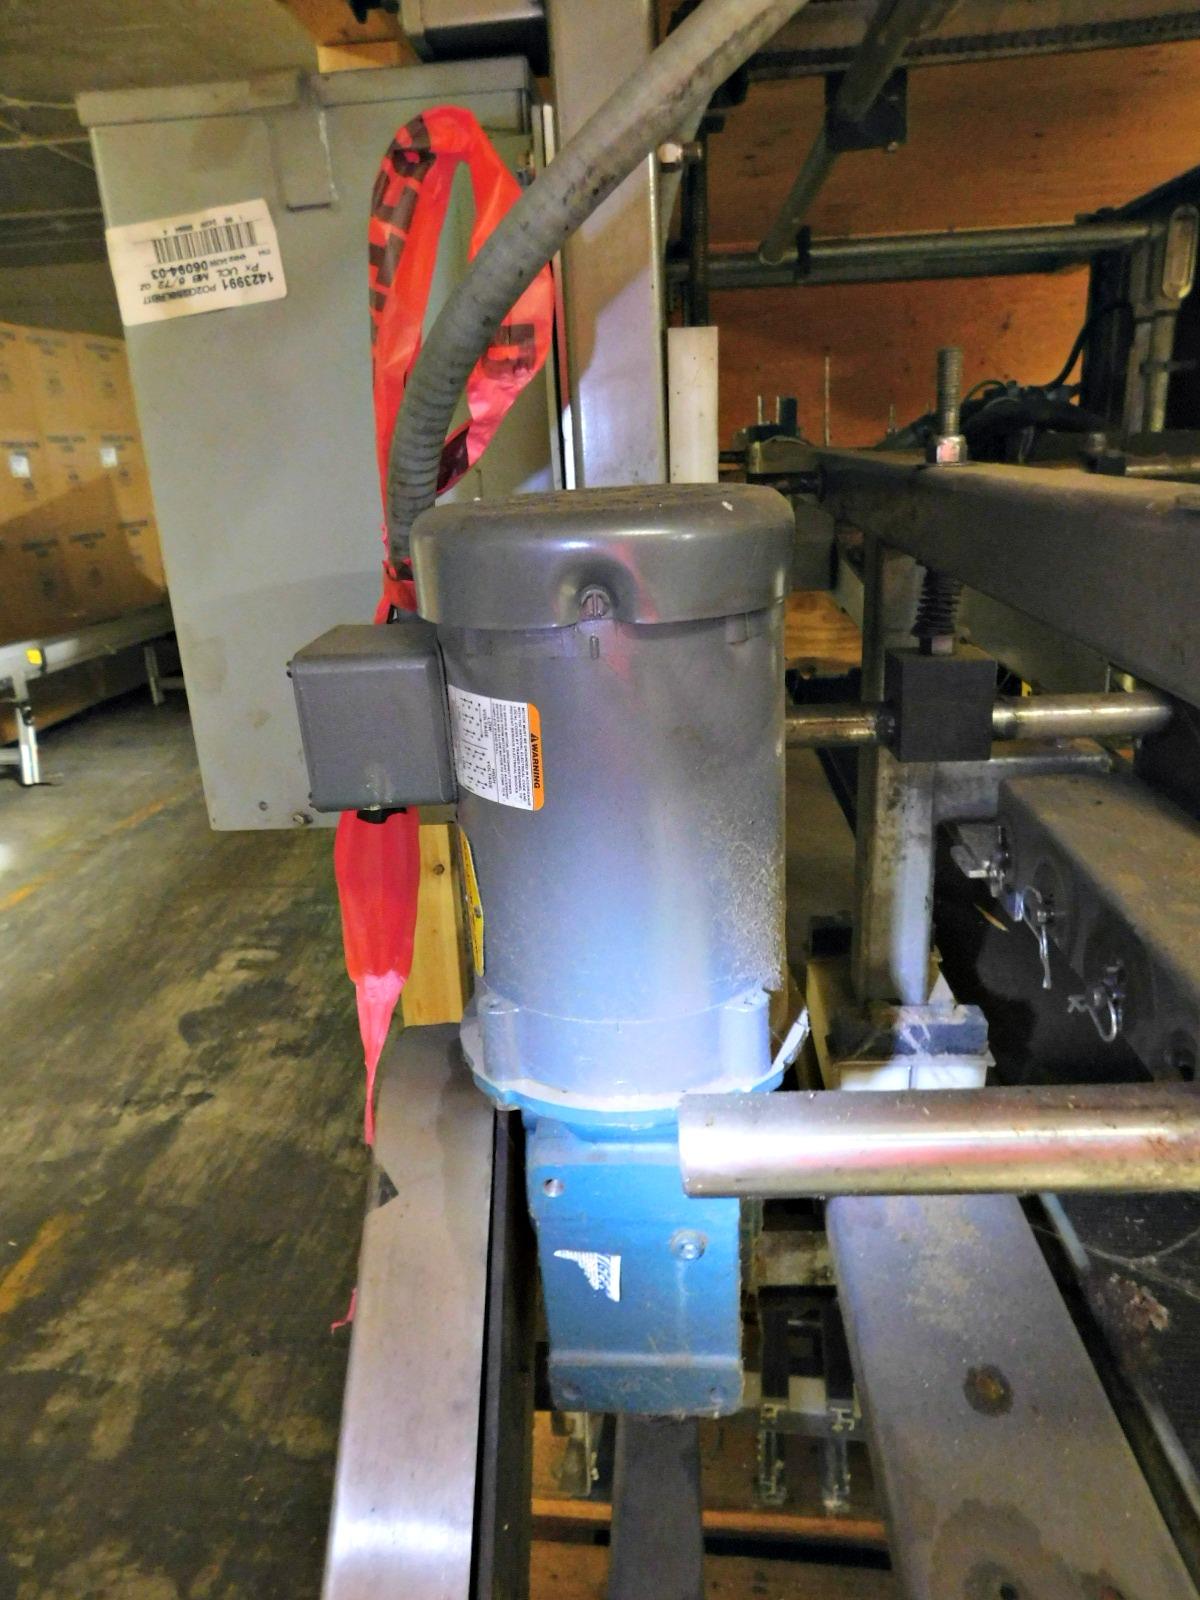 Lot 56 - Case Sealer with a Nordson 3700V-1EBV2F/Allen Bradley SLC500 Programmable Controller :equipment